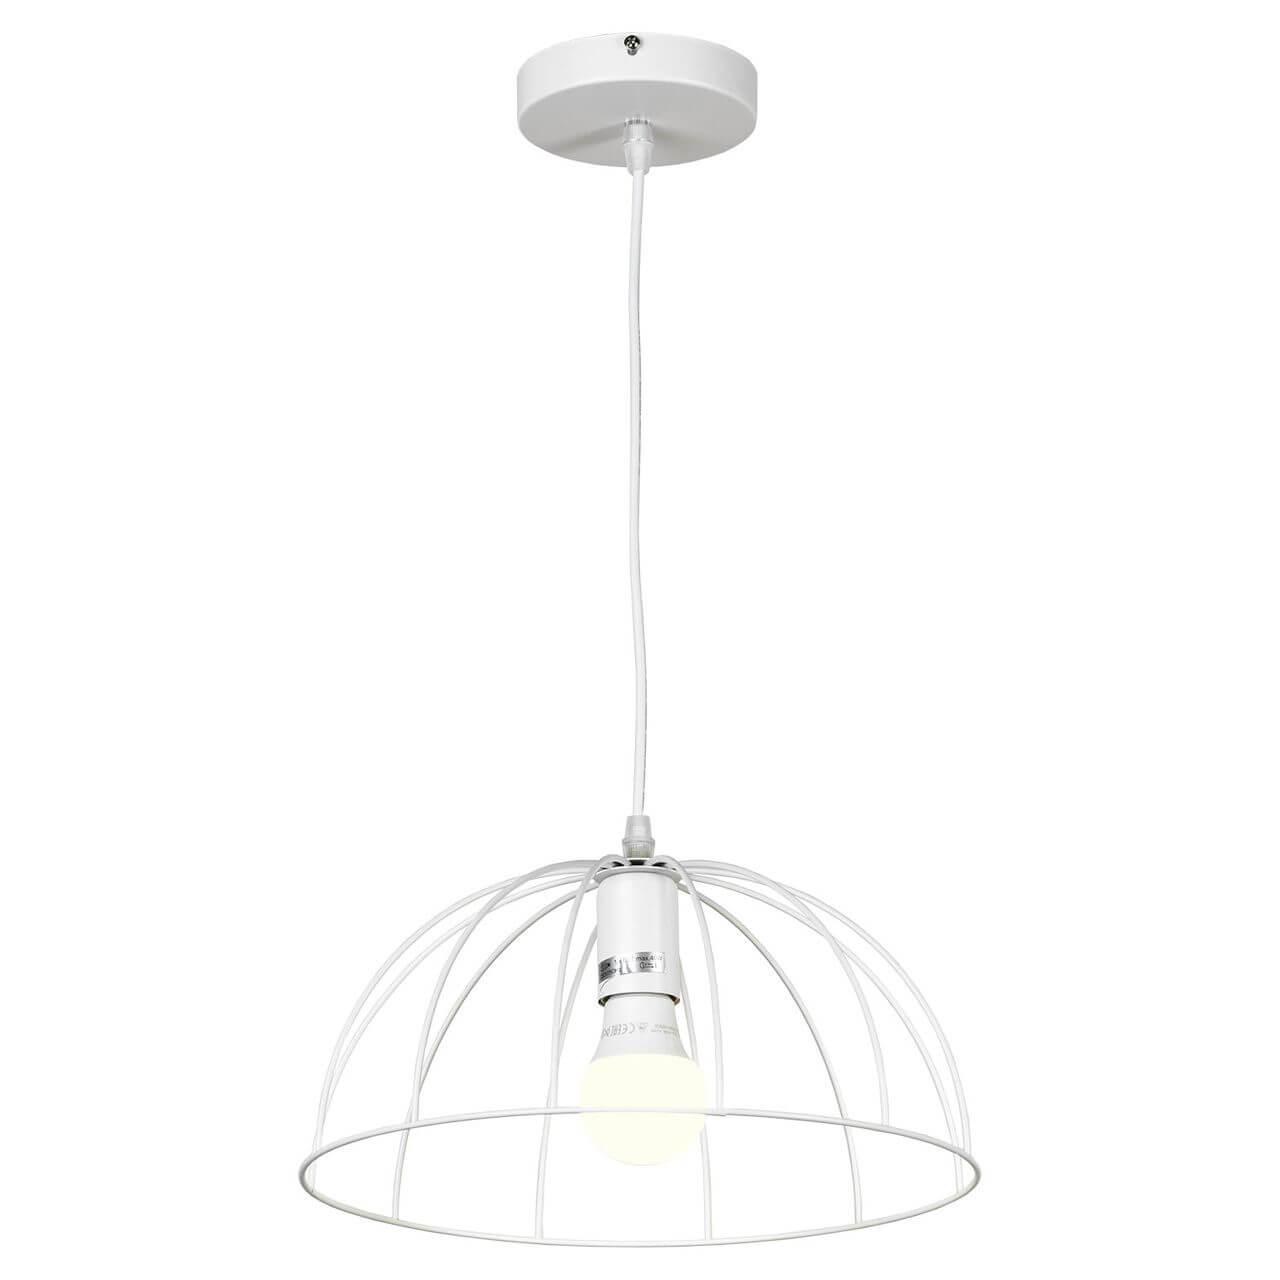 Светильник Lussole GRLSP-8214 Lattice